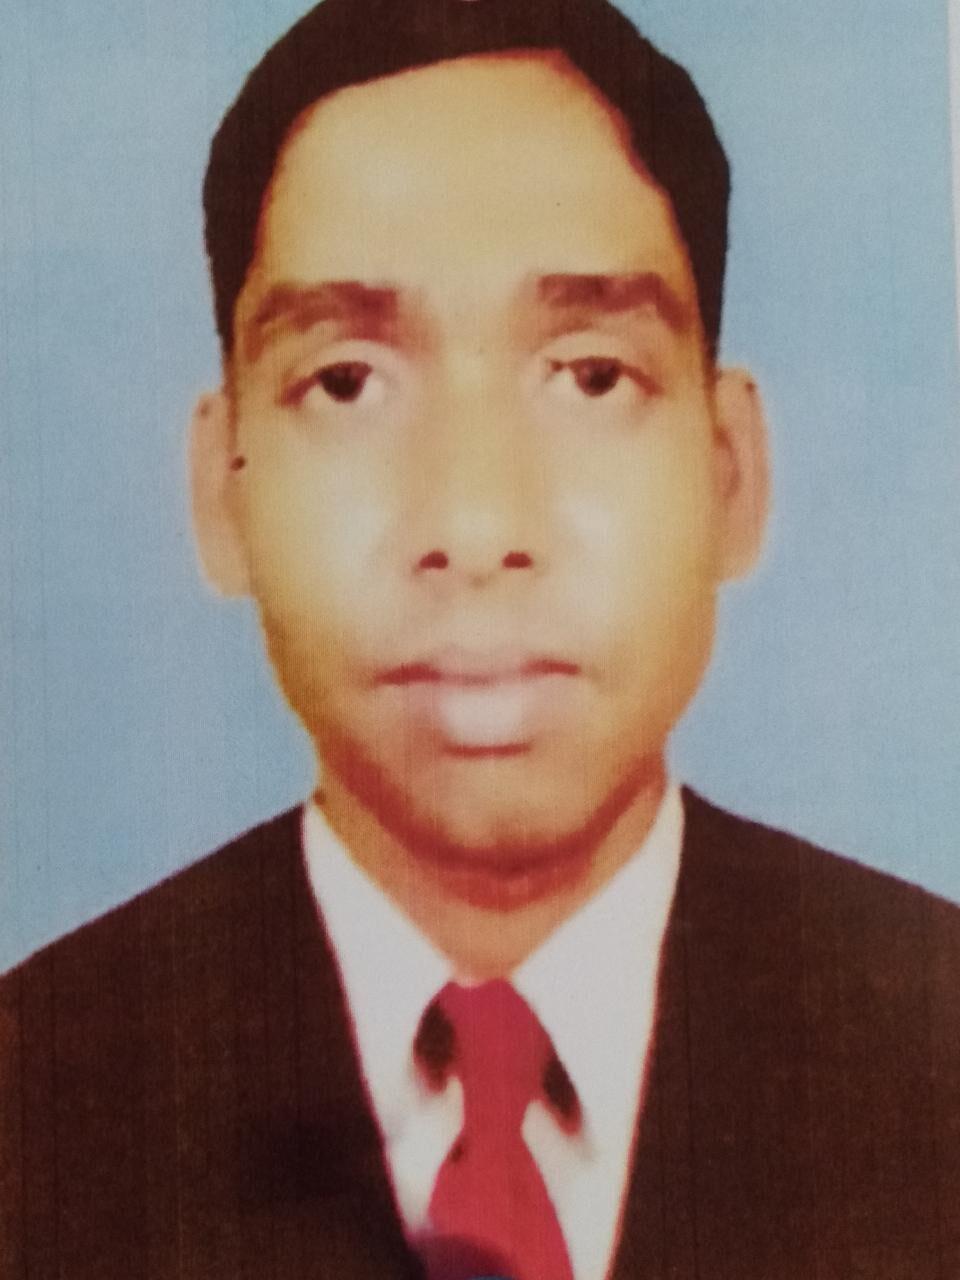 Tamesh pal Company name - Ropoz pharmaceutical